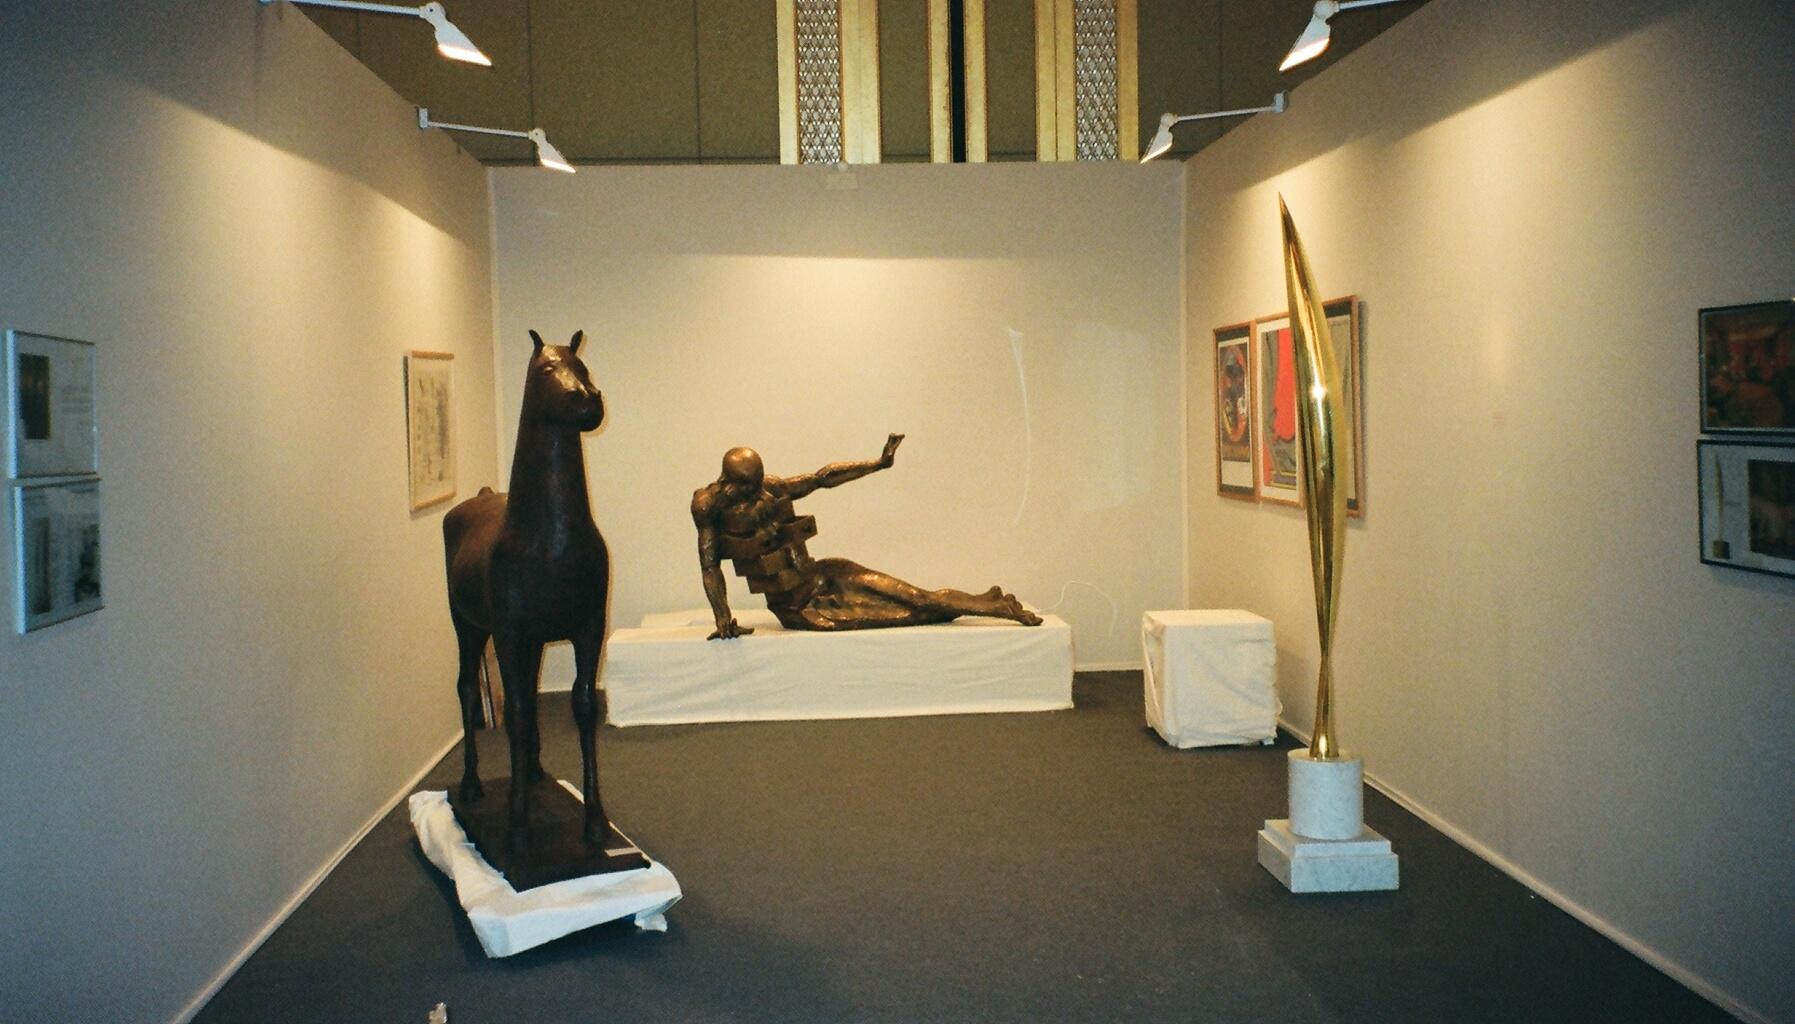 Art Paris Abu Dhabi, 2007 - Marini, Dali, Brancusi